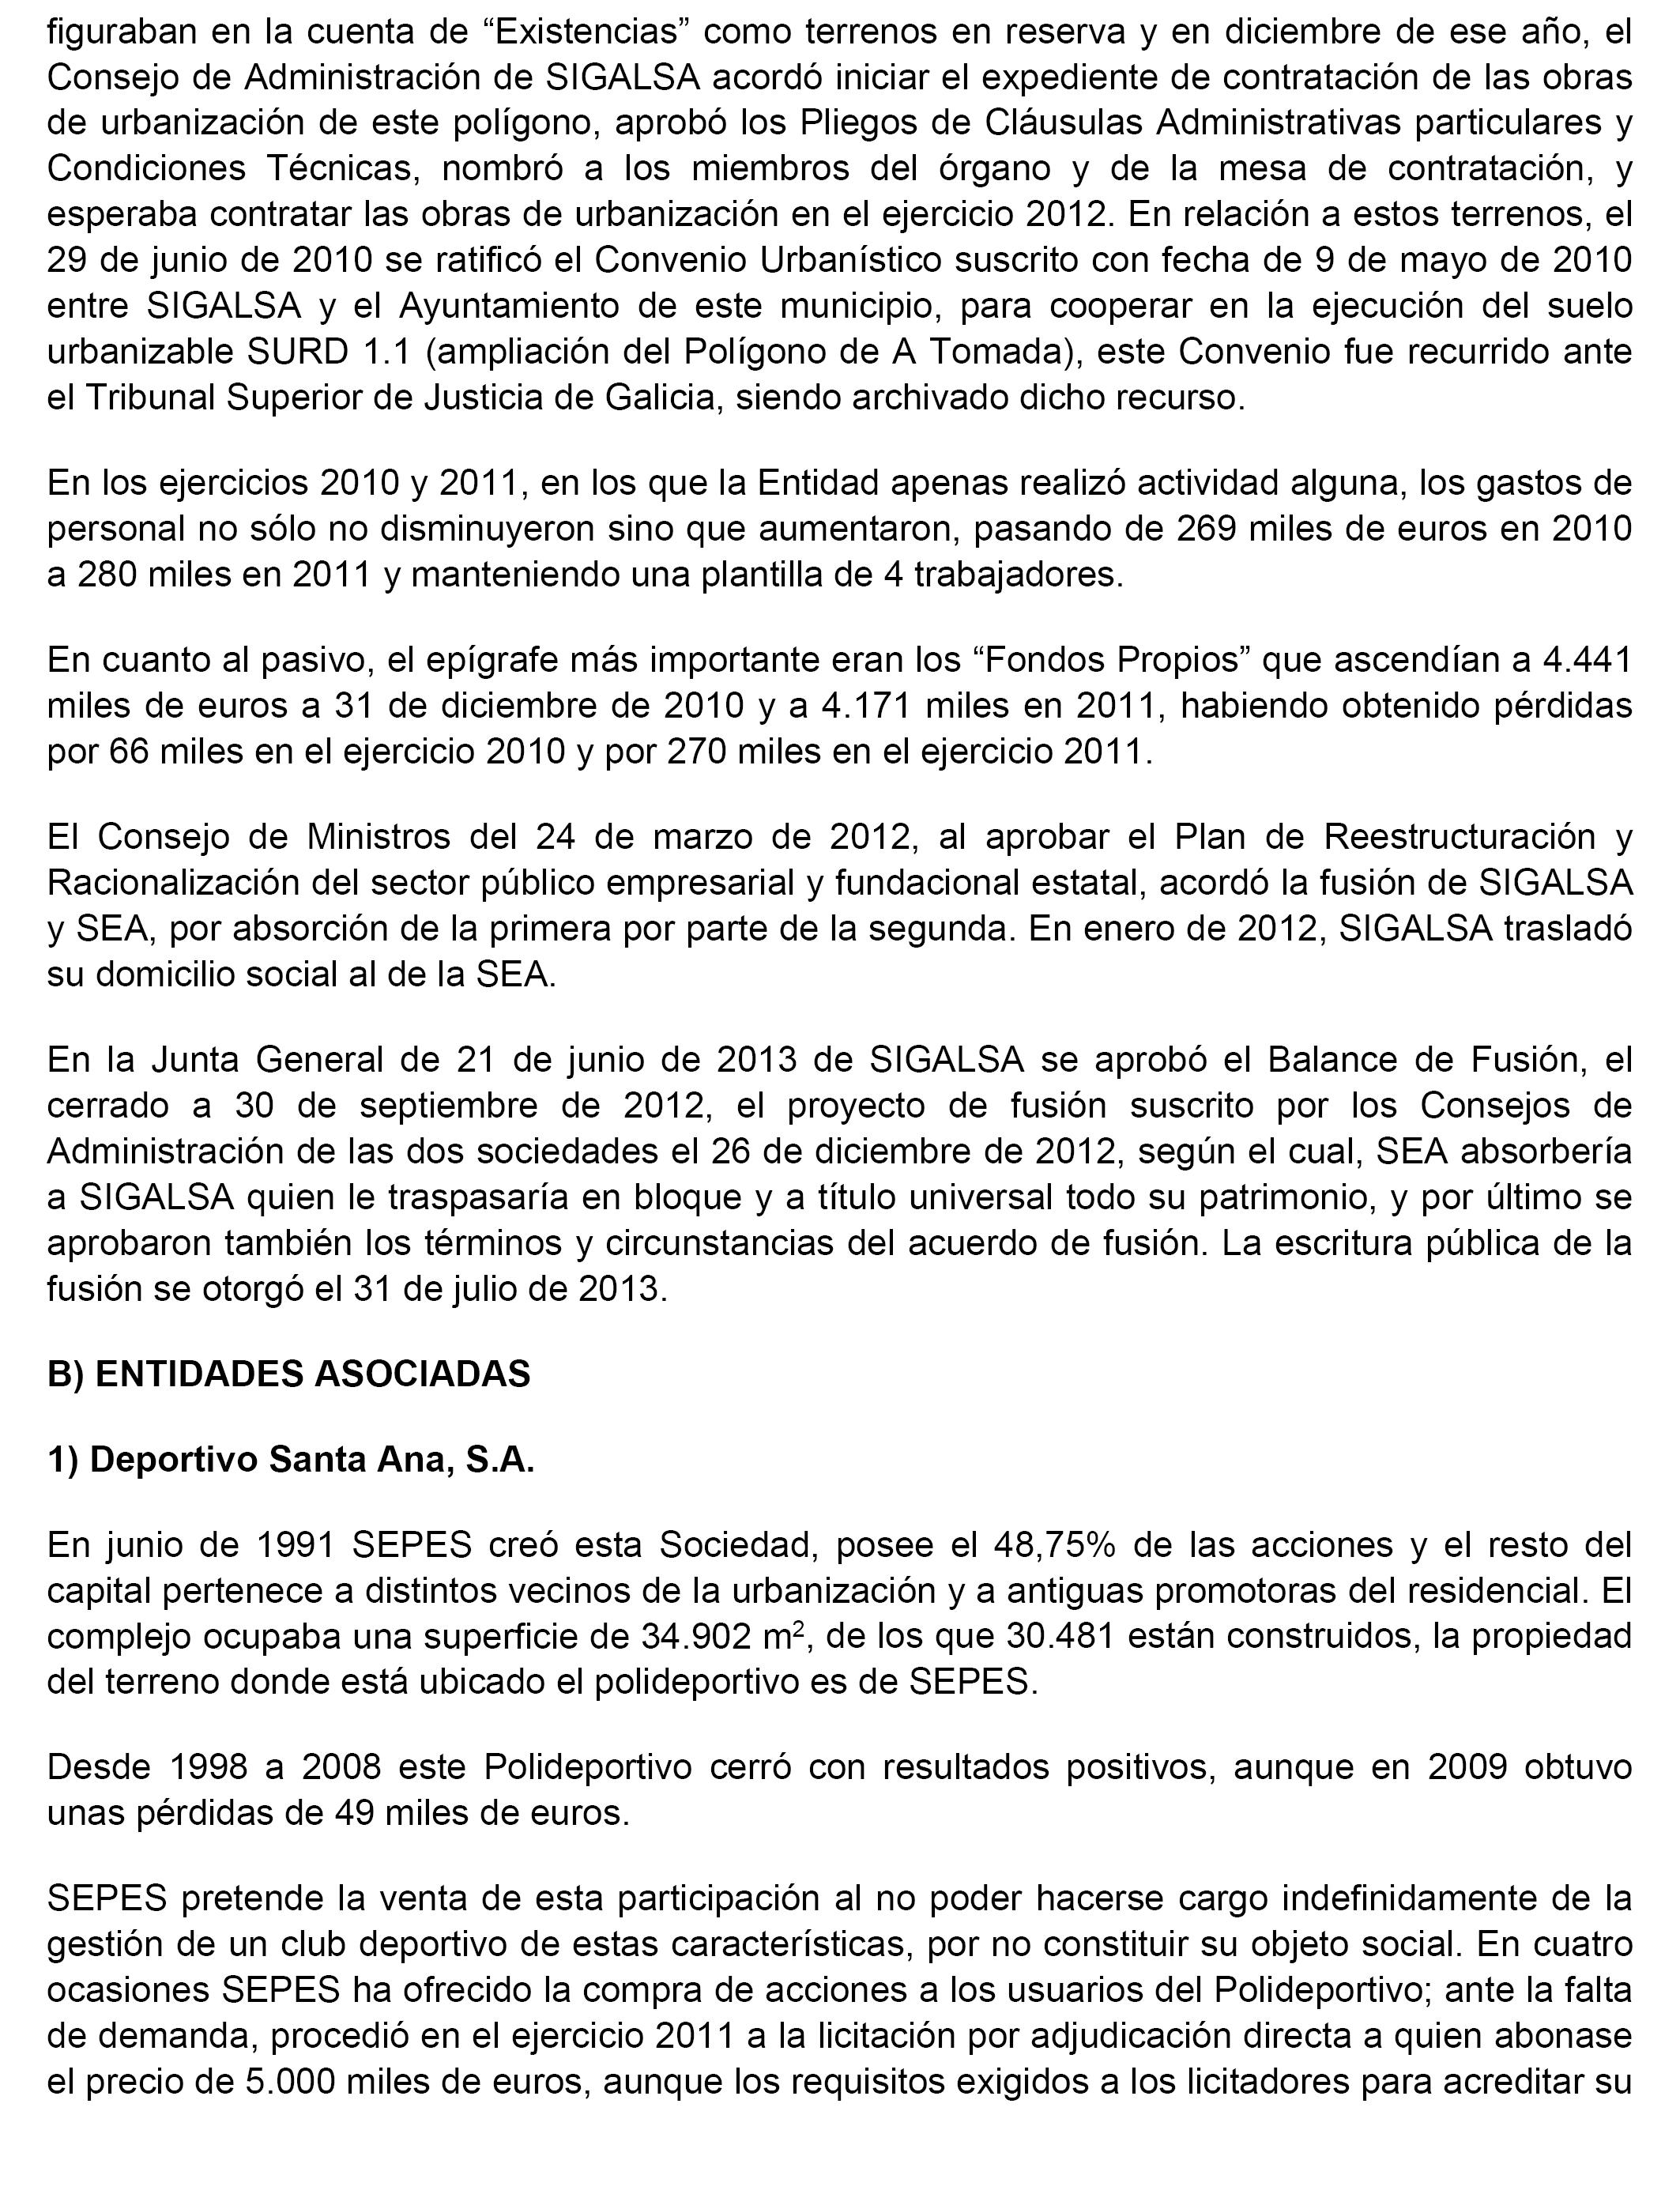 BOE.es - Documento BOE-A-2018-130